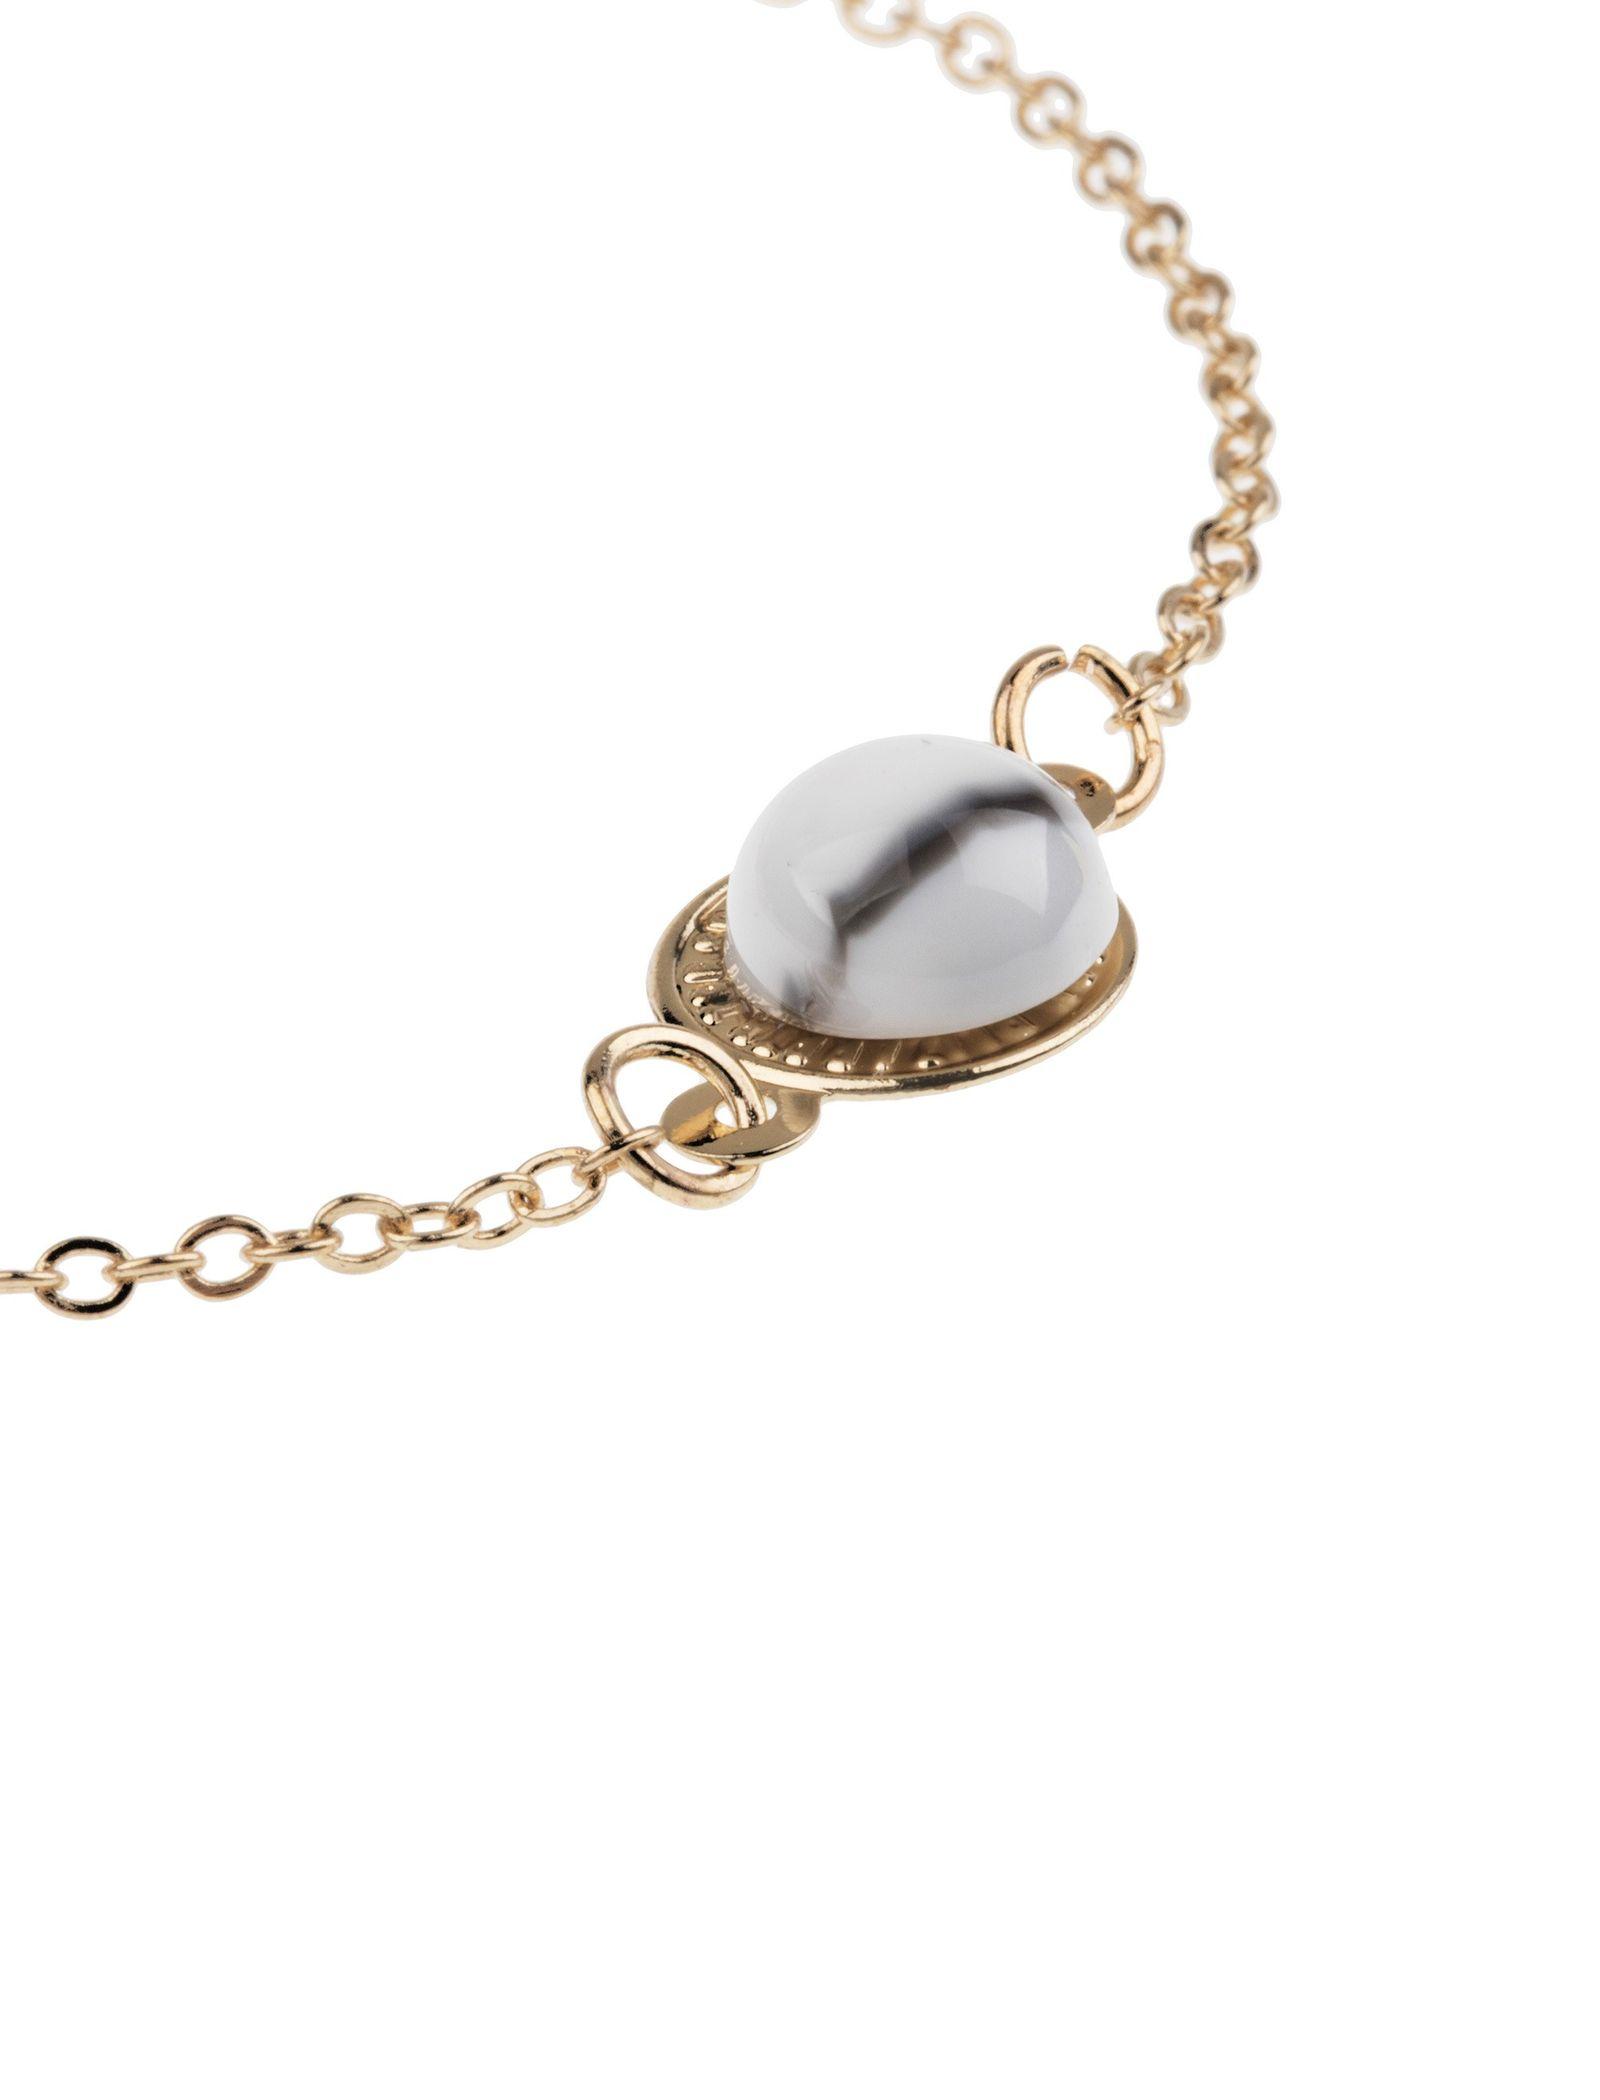 دستبند زنانه بسته 3 عددی - کوتون - طلايي/ طوسي - 4